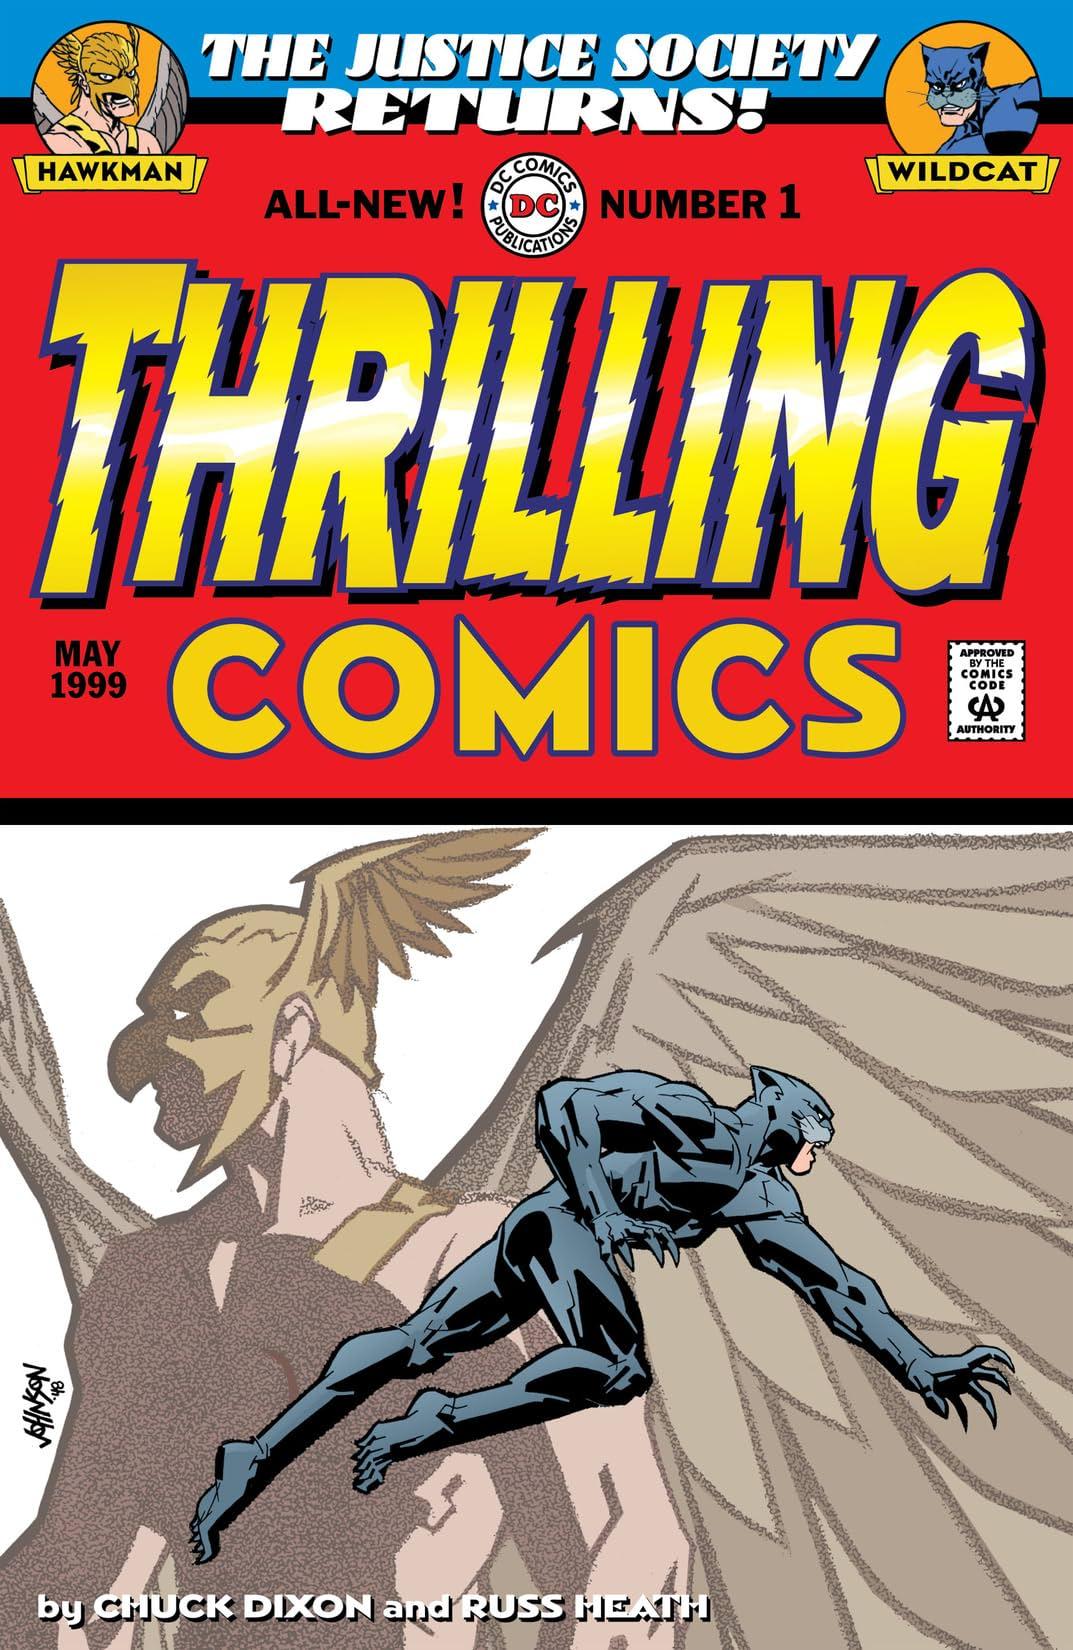 Thrilling Comics (1999) #1